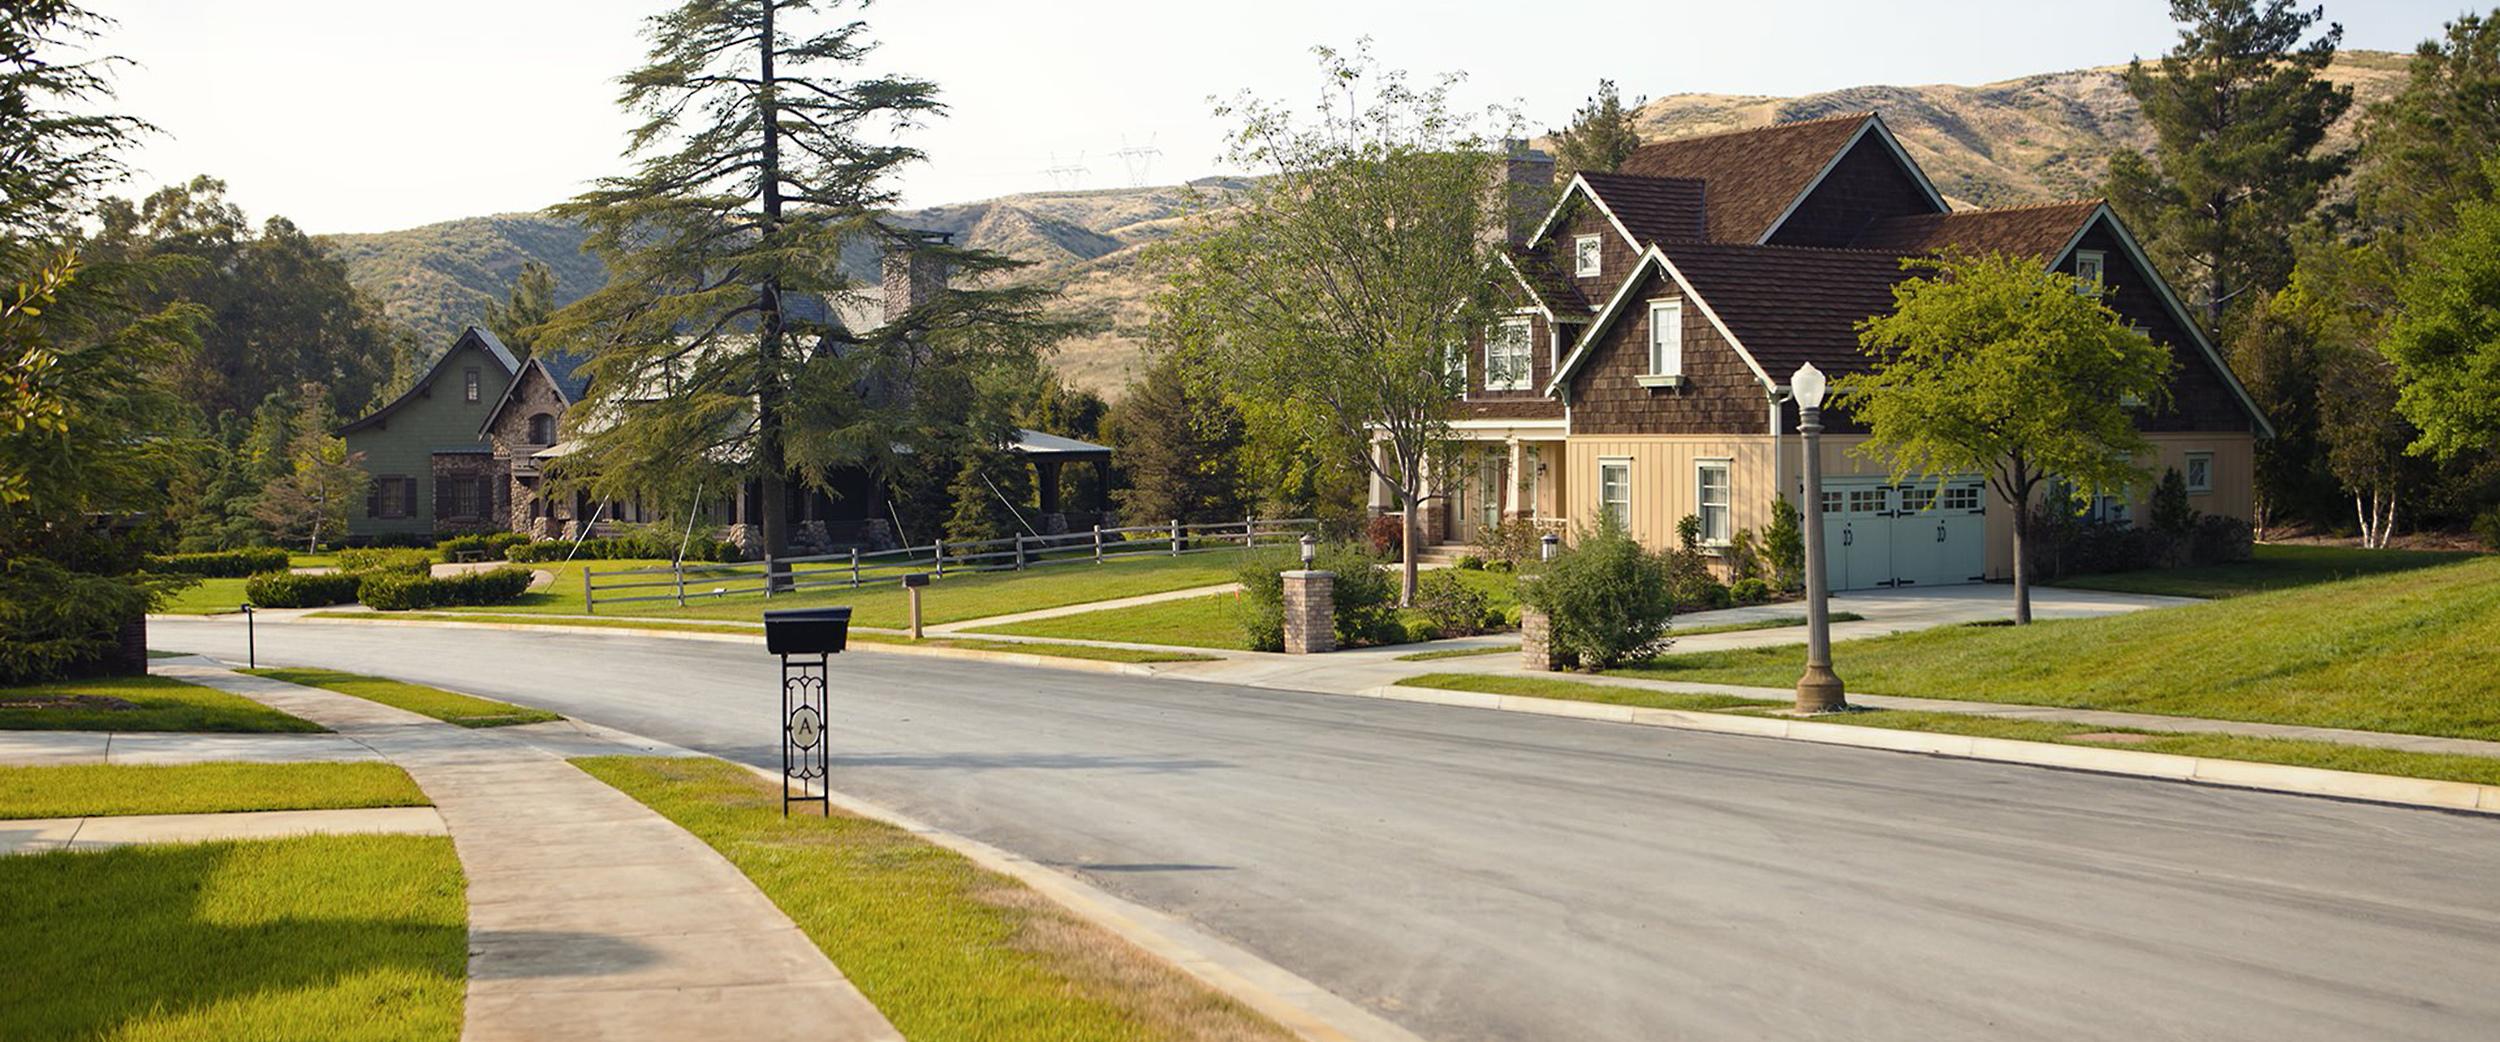 neighborhood-block-view_A.jpg